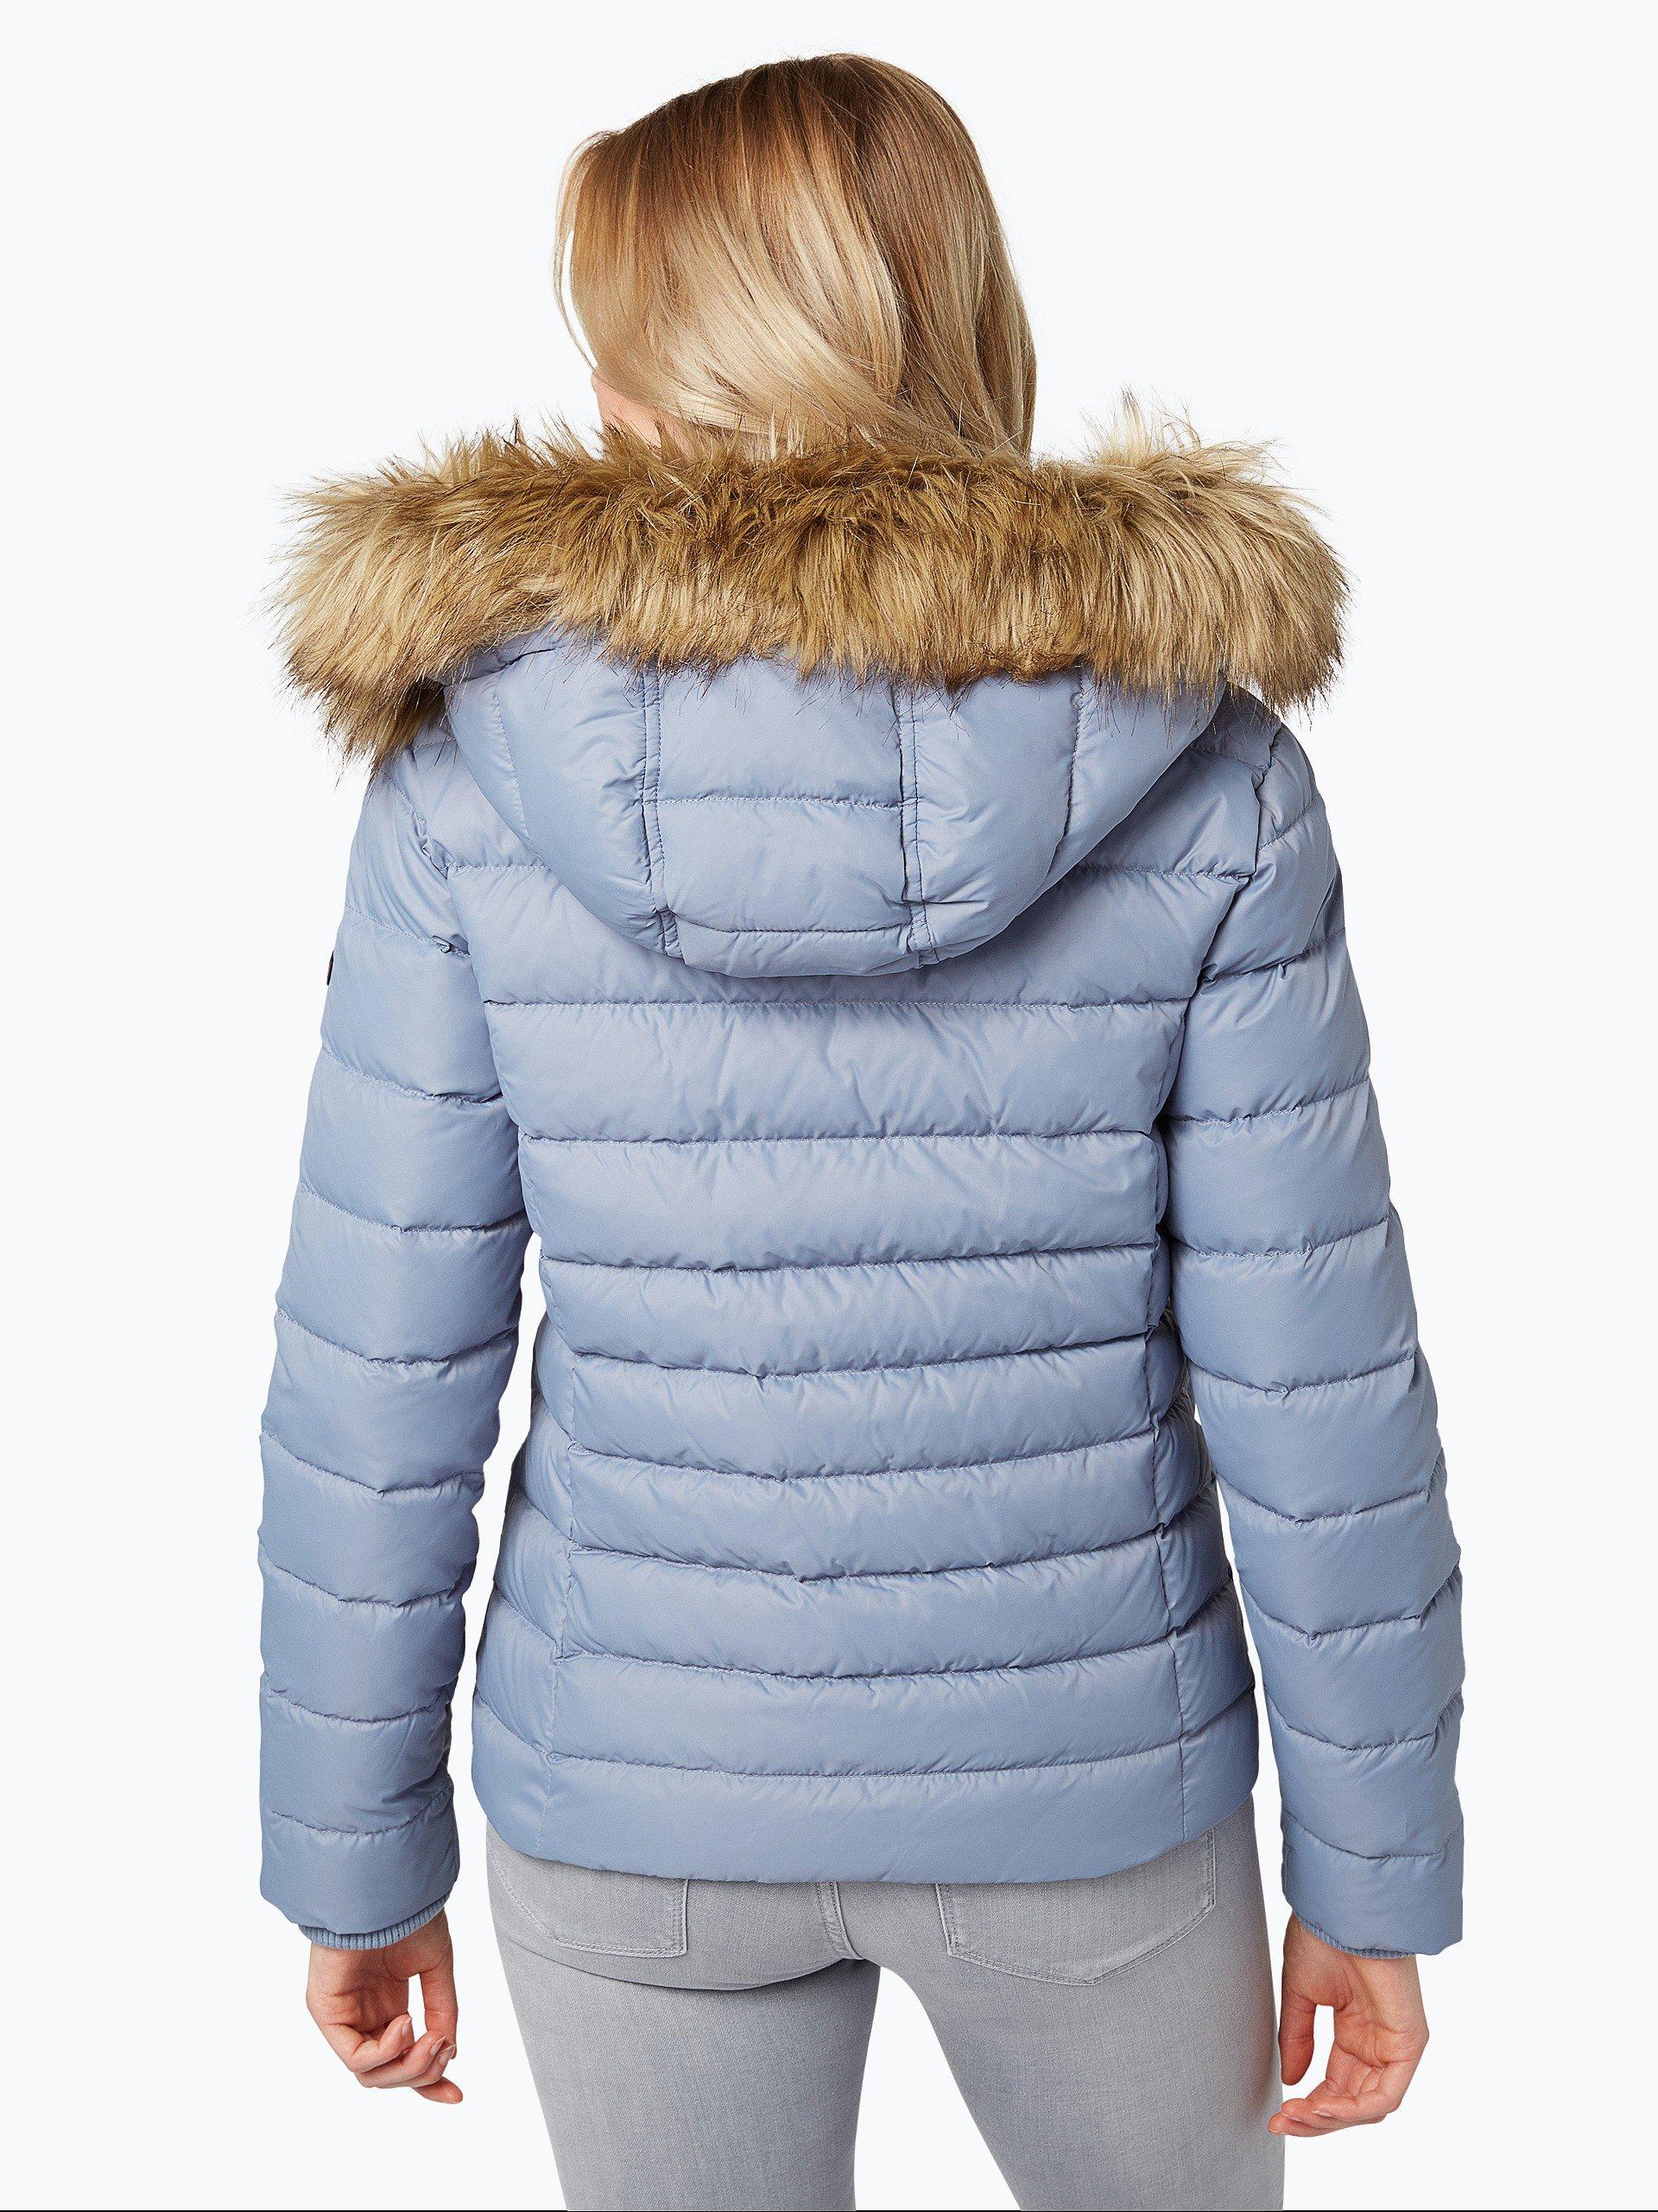 tommy jeans damen daunenjacke blau uni online kaufen peek und cloppenburg de. Black Bedroom Furniture Sets. Home Design Ideas